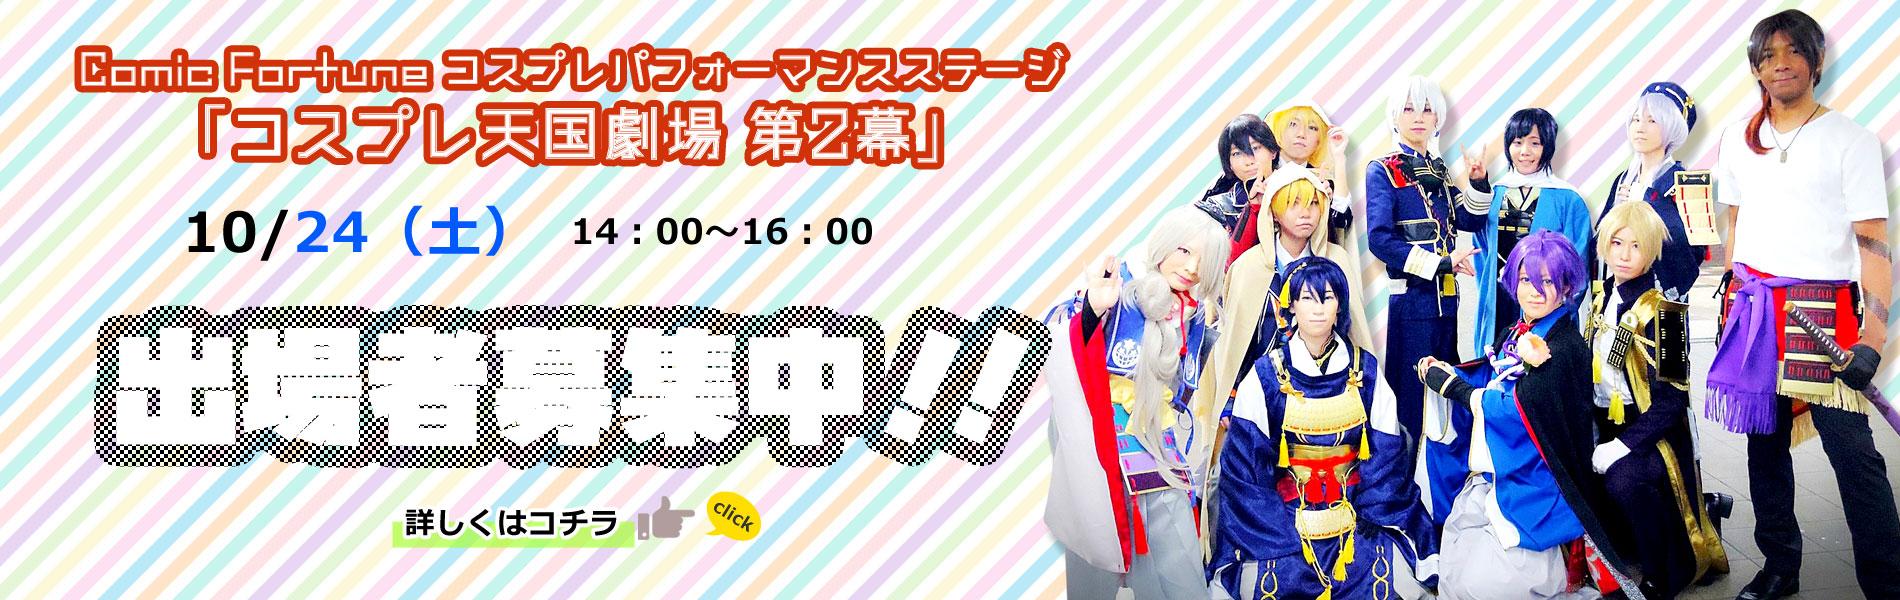 CF コスプレパフォーマンスステージ 「コスプレ天国劇場 第2幕」出場者募集中!!